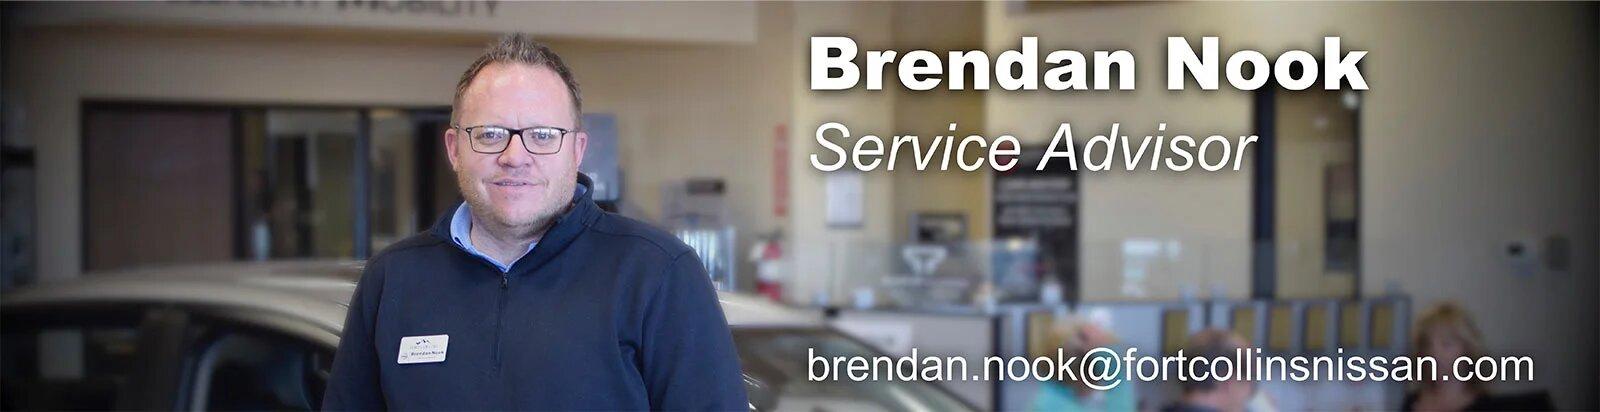 Service Advisor Brendan Nook